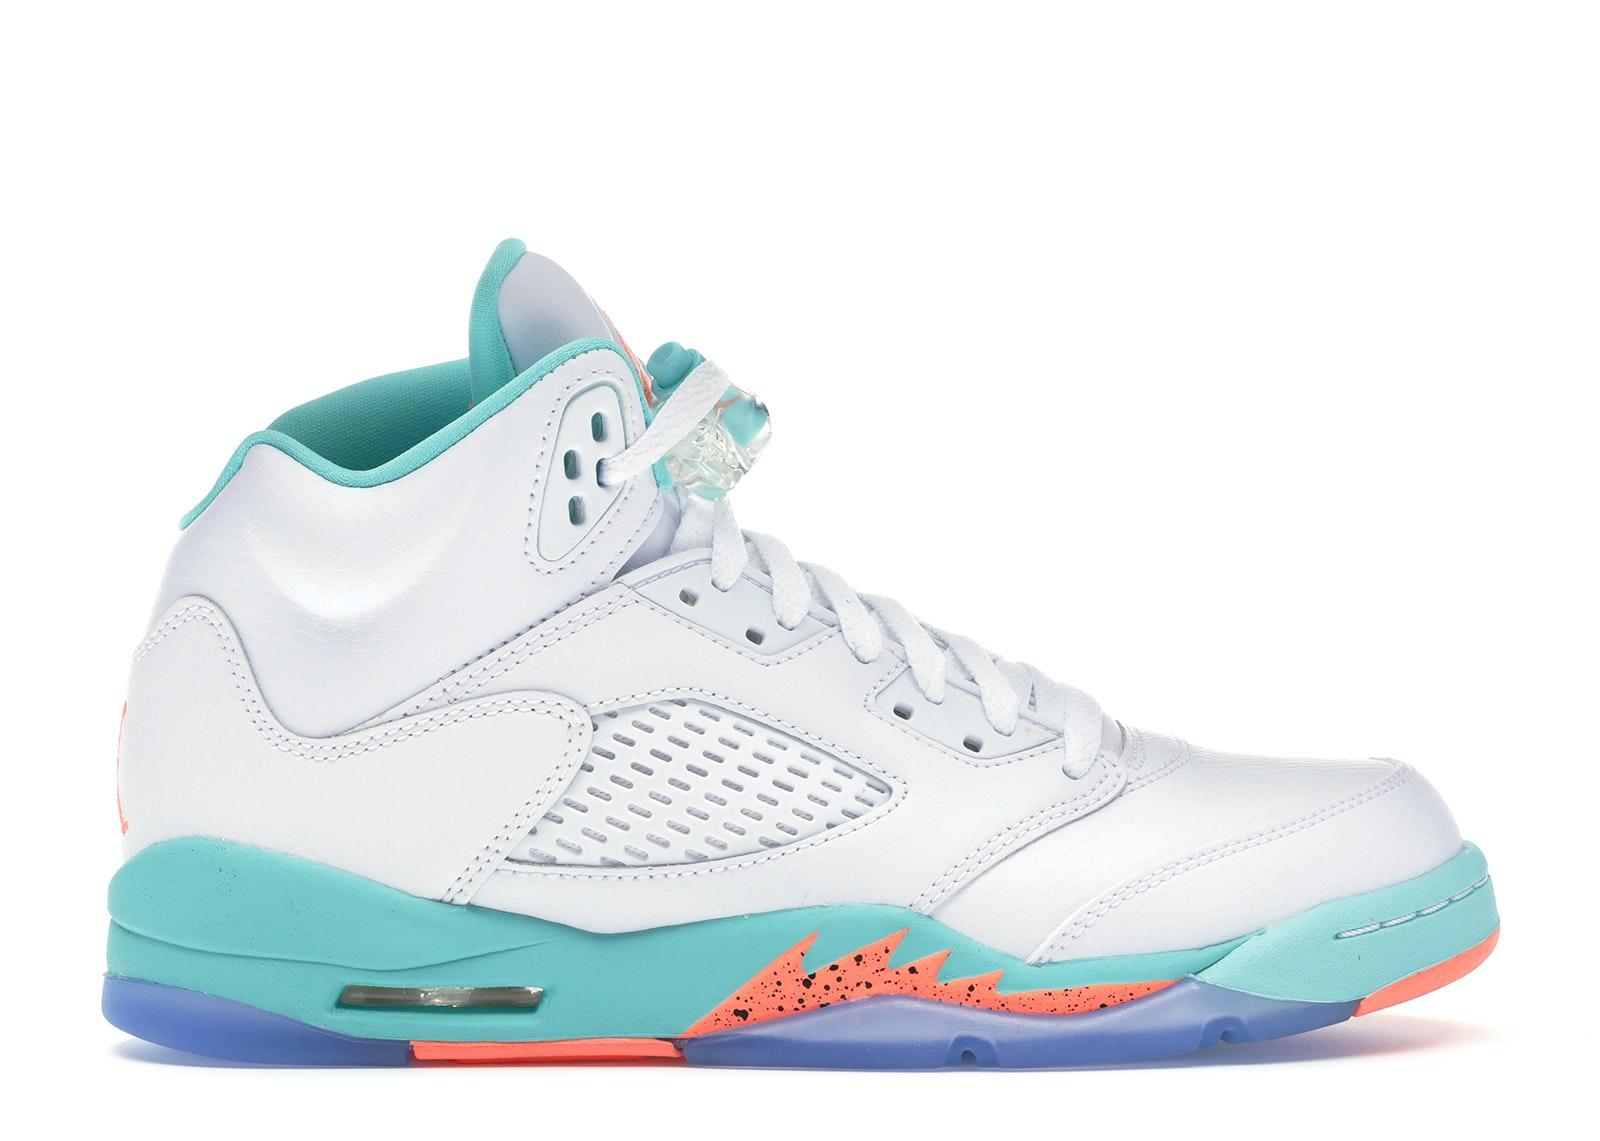 Jordan 5 Retro Light Aqua (GS)